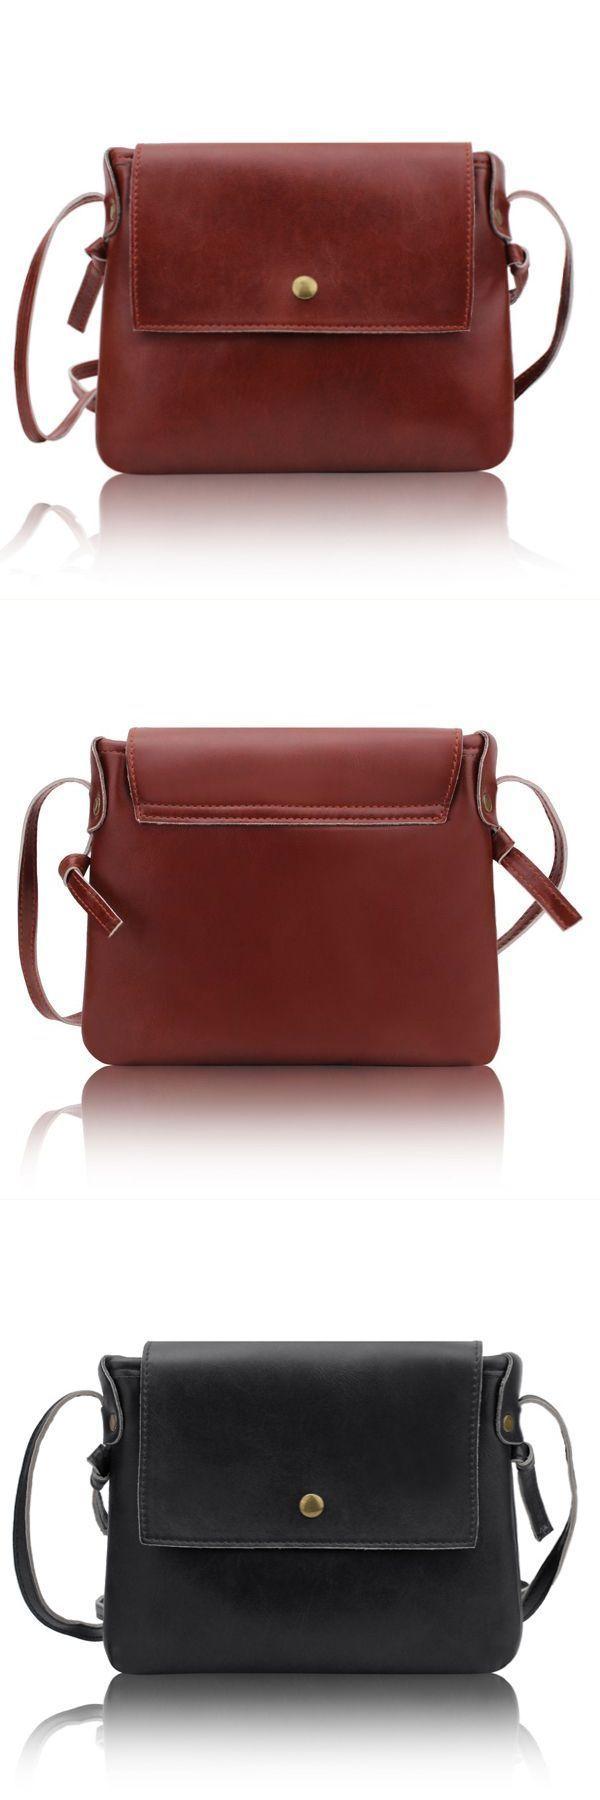 Women vintage crossbody bags envelop bags shoulder bags small messenger bags b makowsky crossbody bags #cross #body #bags #garage #crossbody #bags #at #target #crossbody #bags #jcpenney #crossbody #bags #next